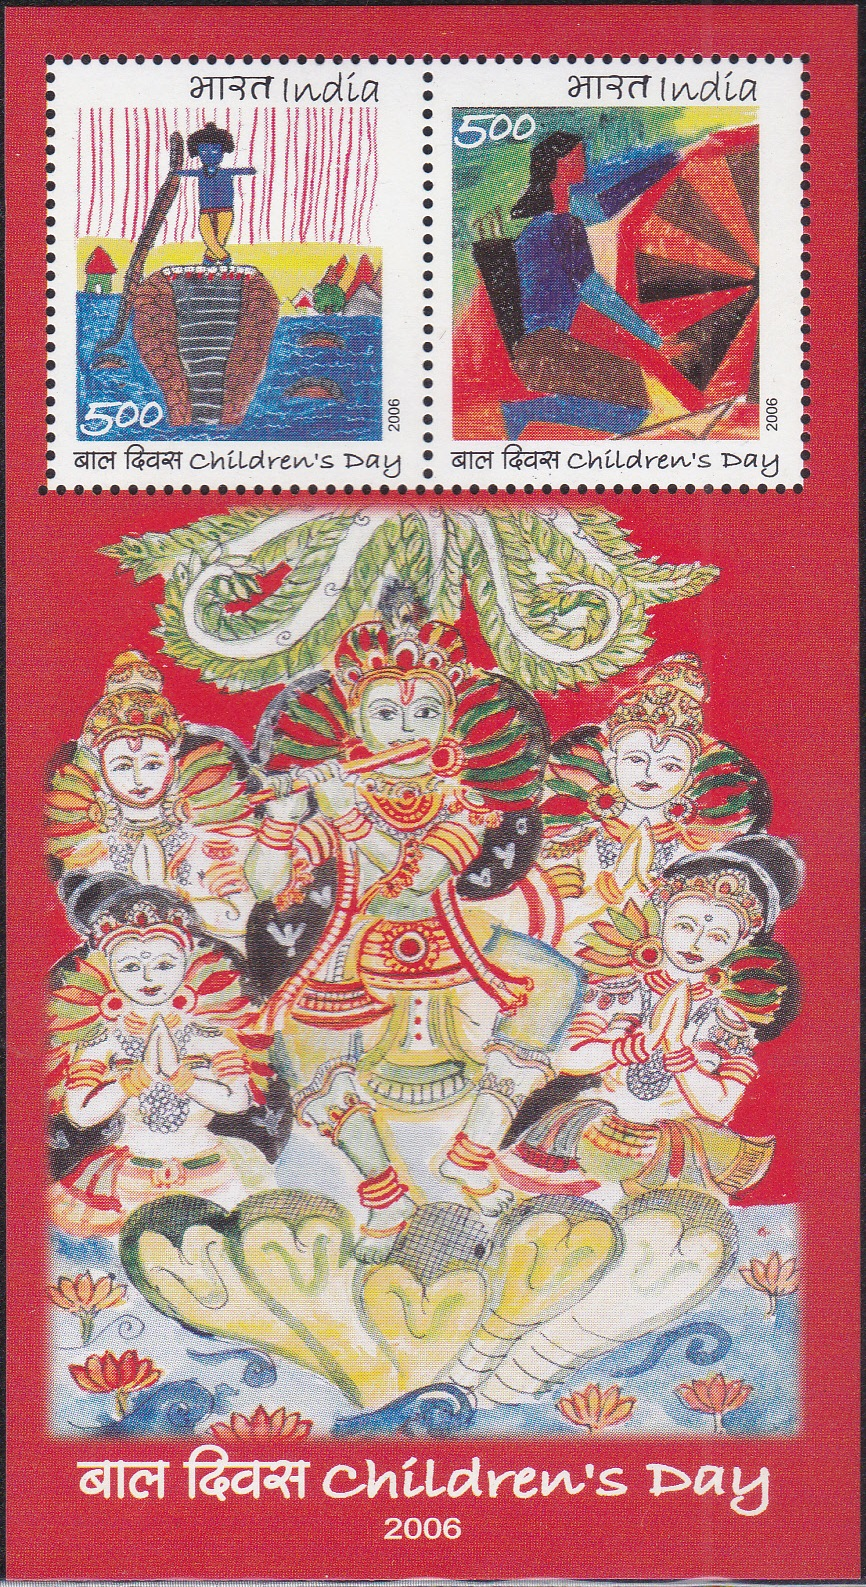 Krishna Kaliya Daman : My favourite mythological hero